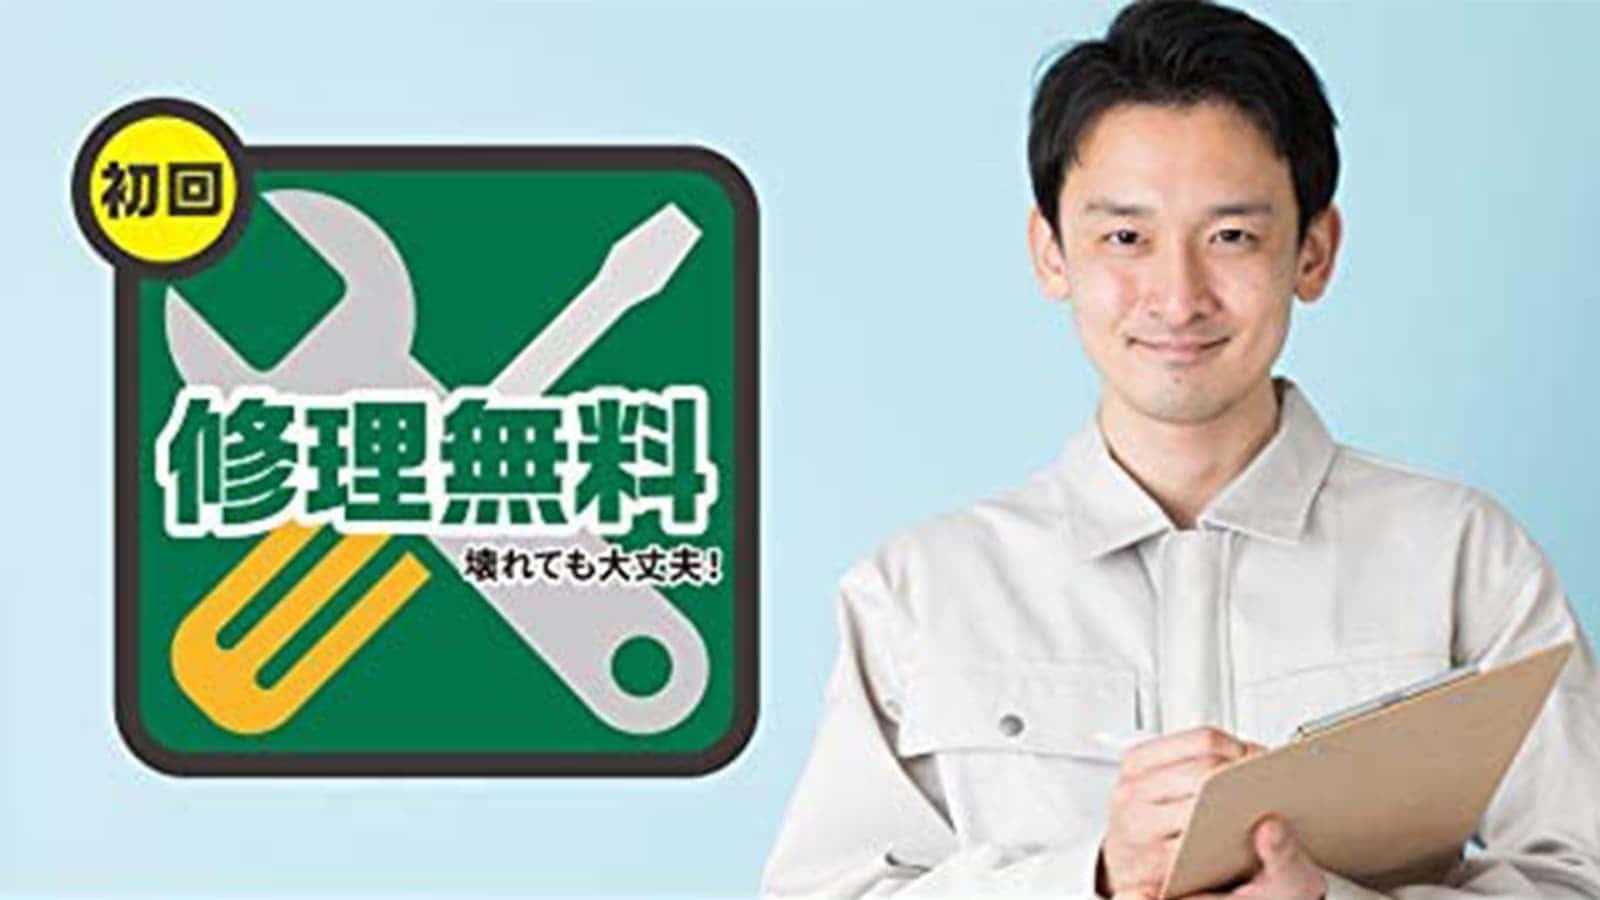 HiKOKI 初回修理保証付き電動工具を展開【Amazon限定】